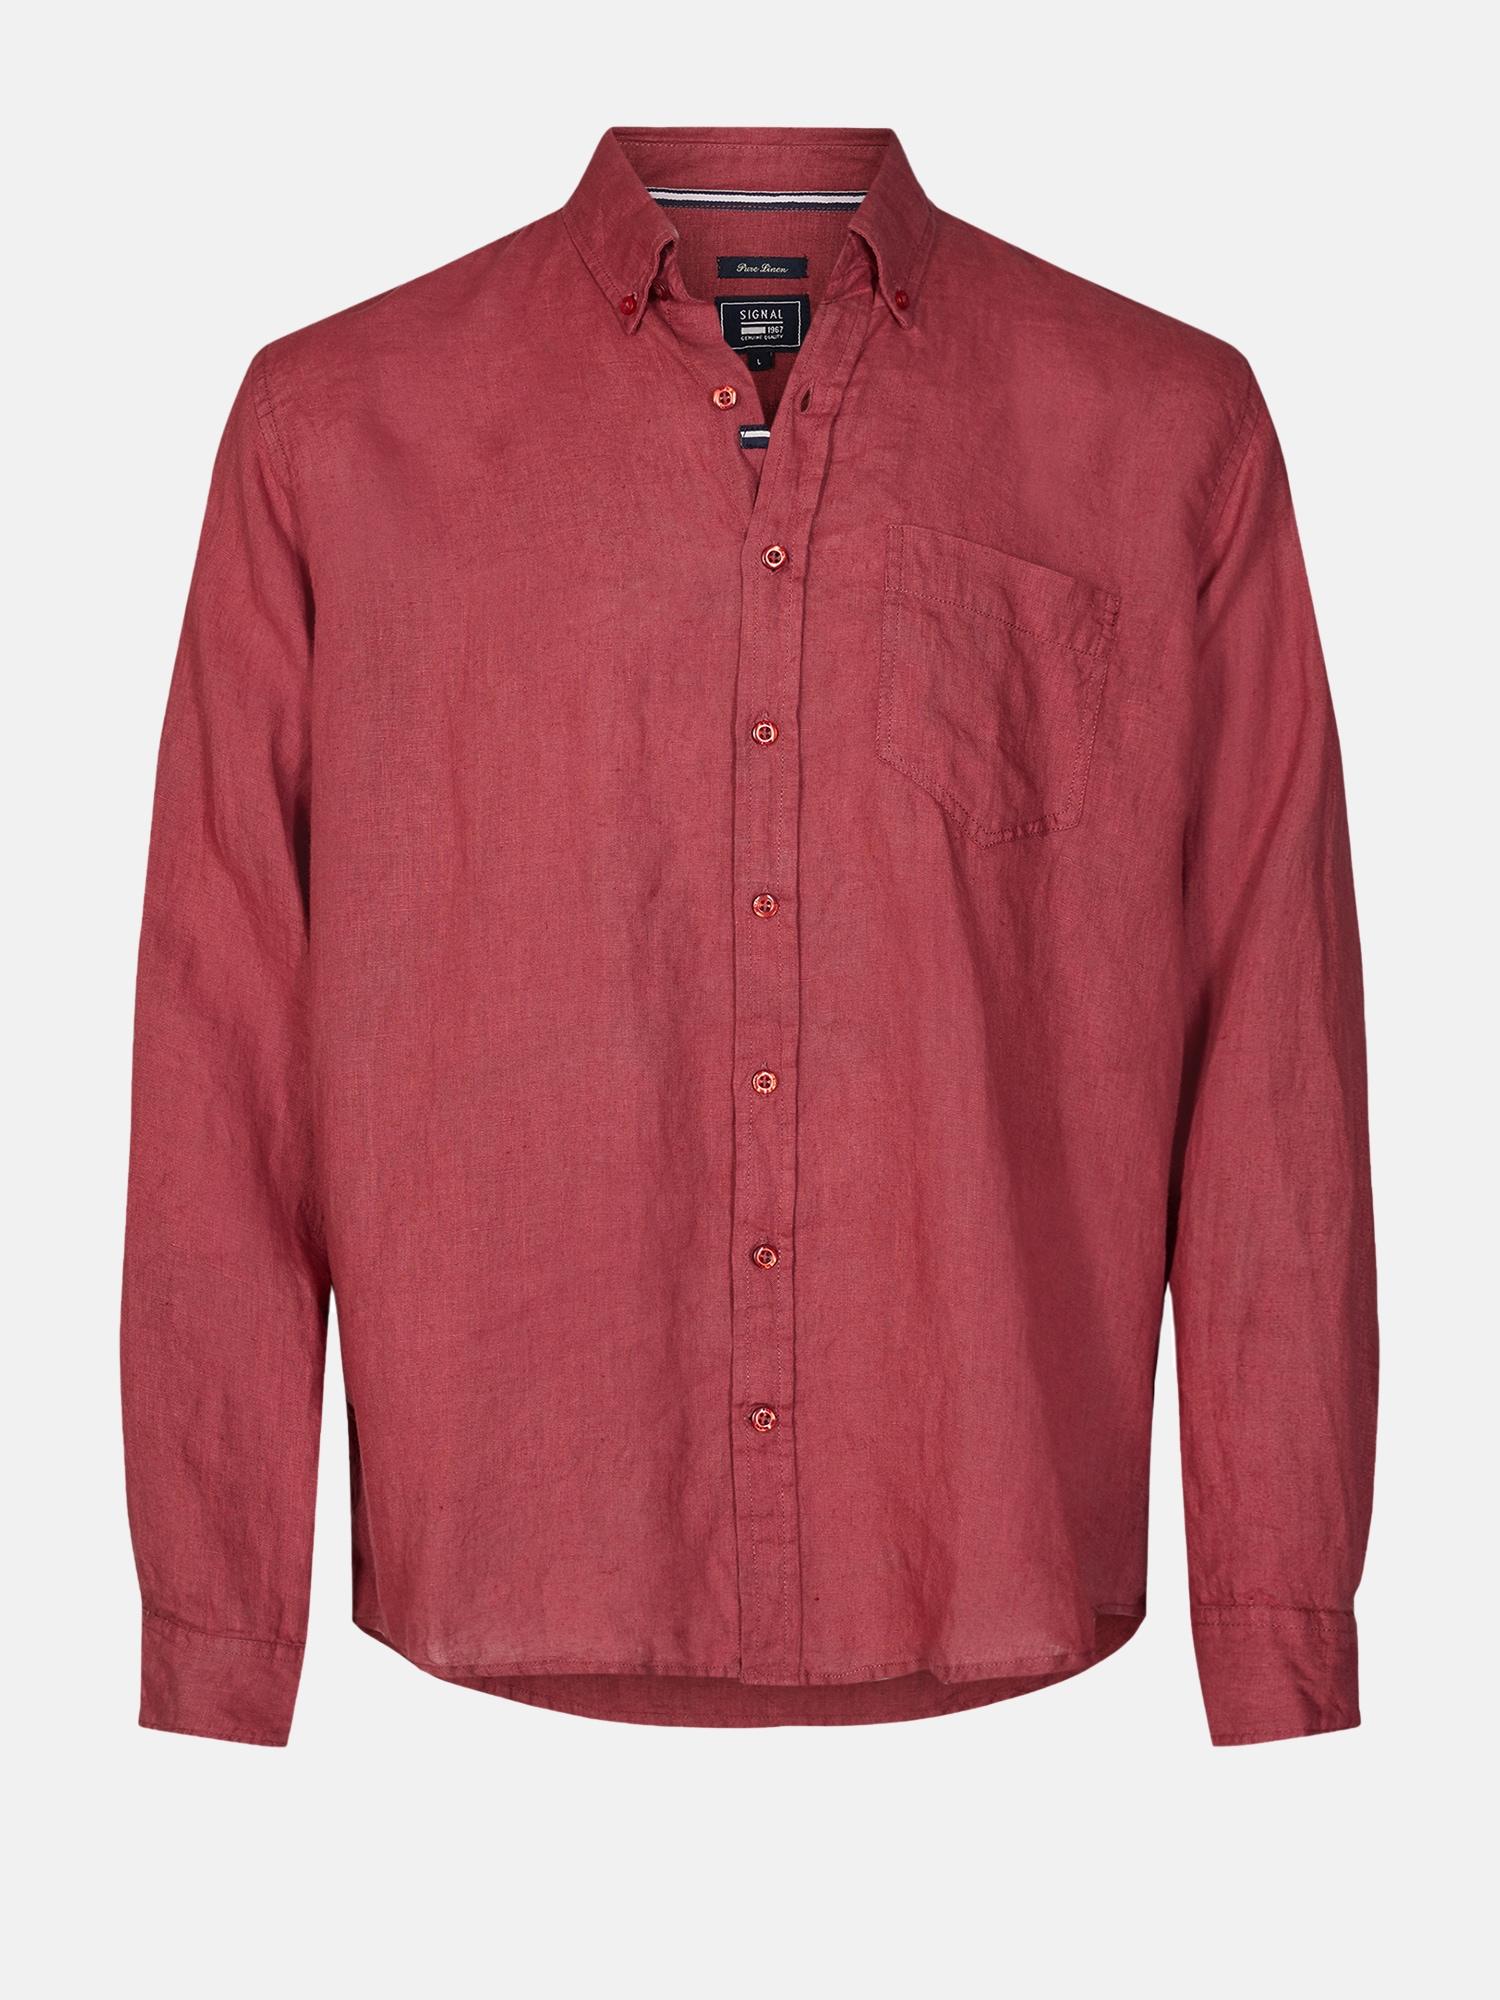 Andreas Linen Shirt